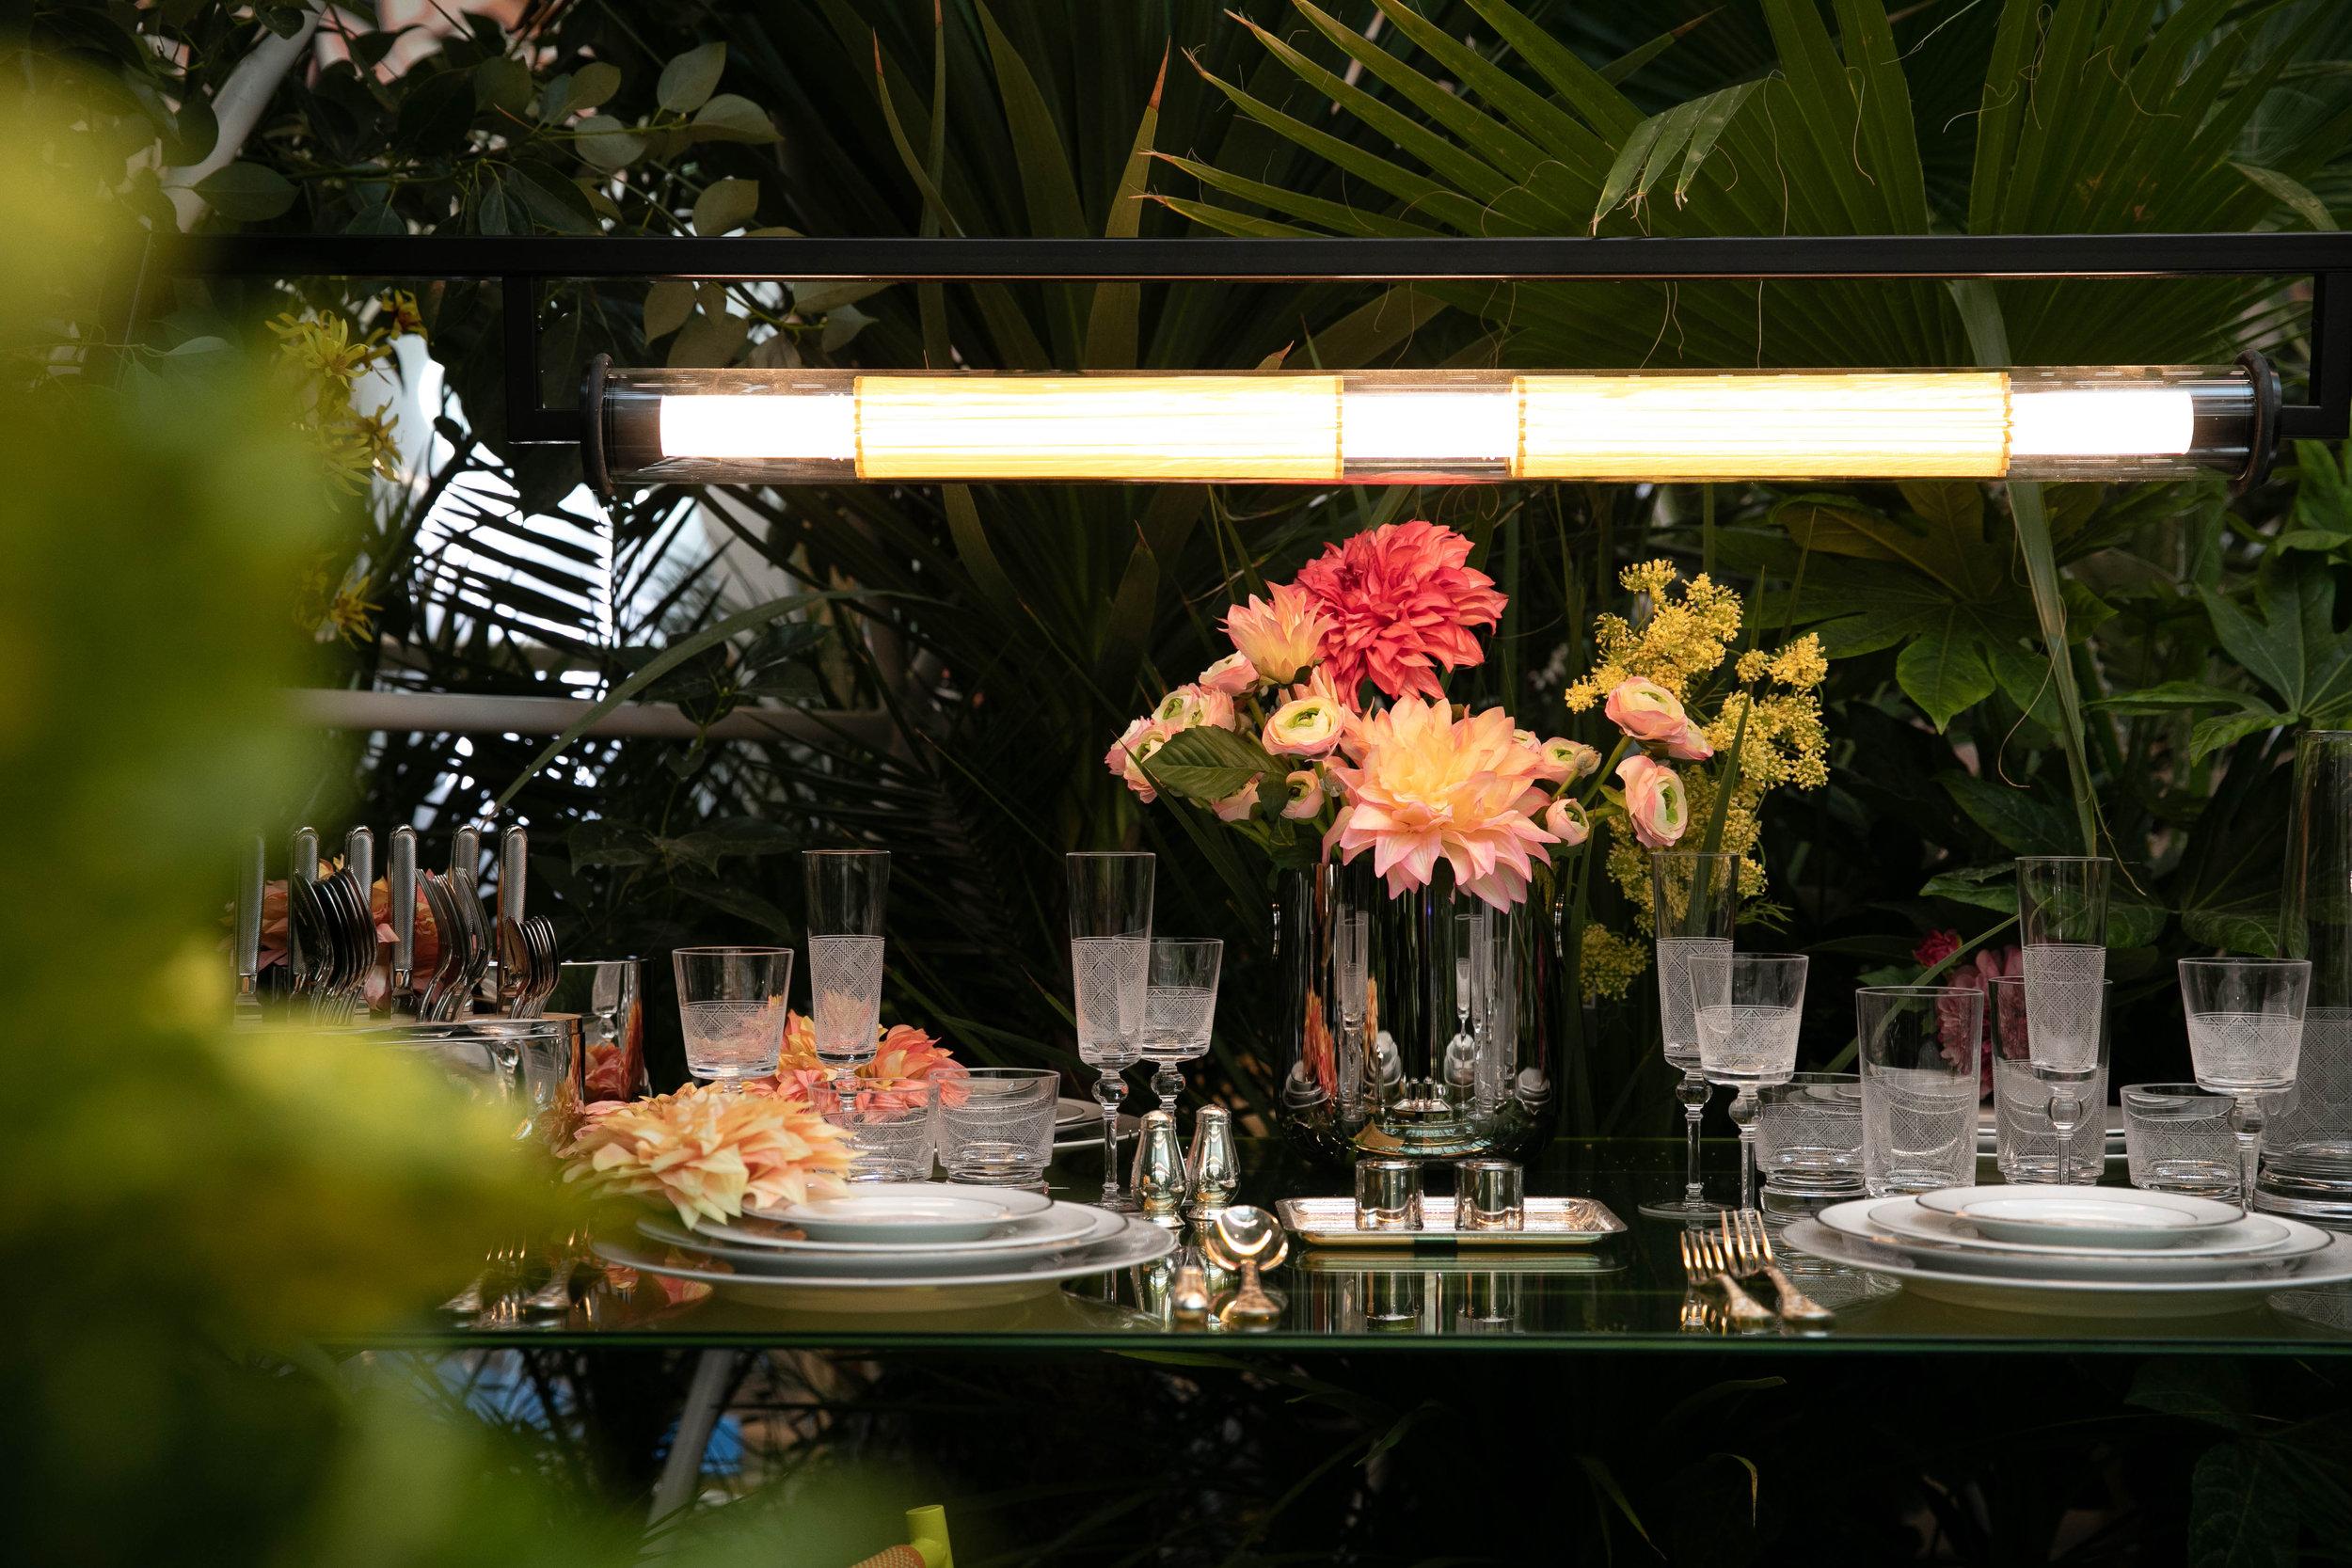 equiphotel_tradeshow_paris_terraces_gardens_outdoor_design_christophe_gautrand_landscape_10.jpg